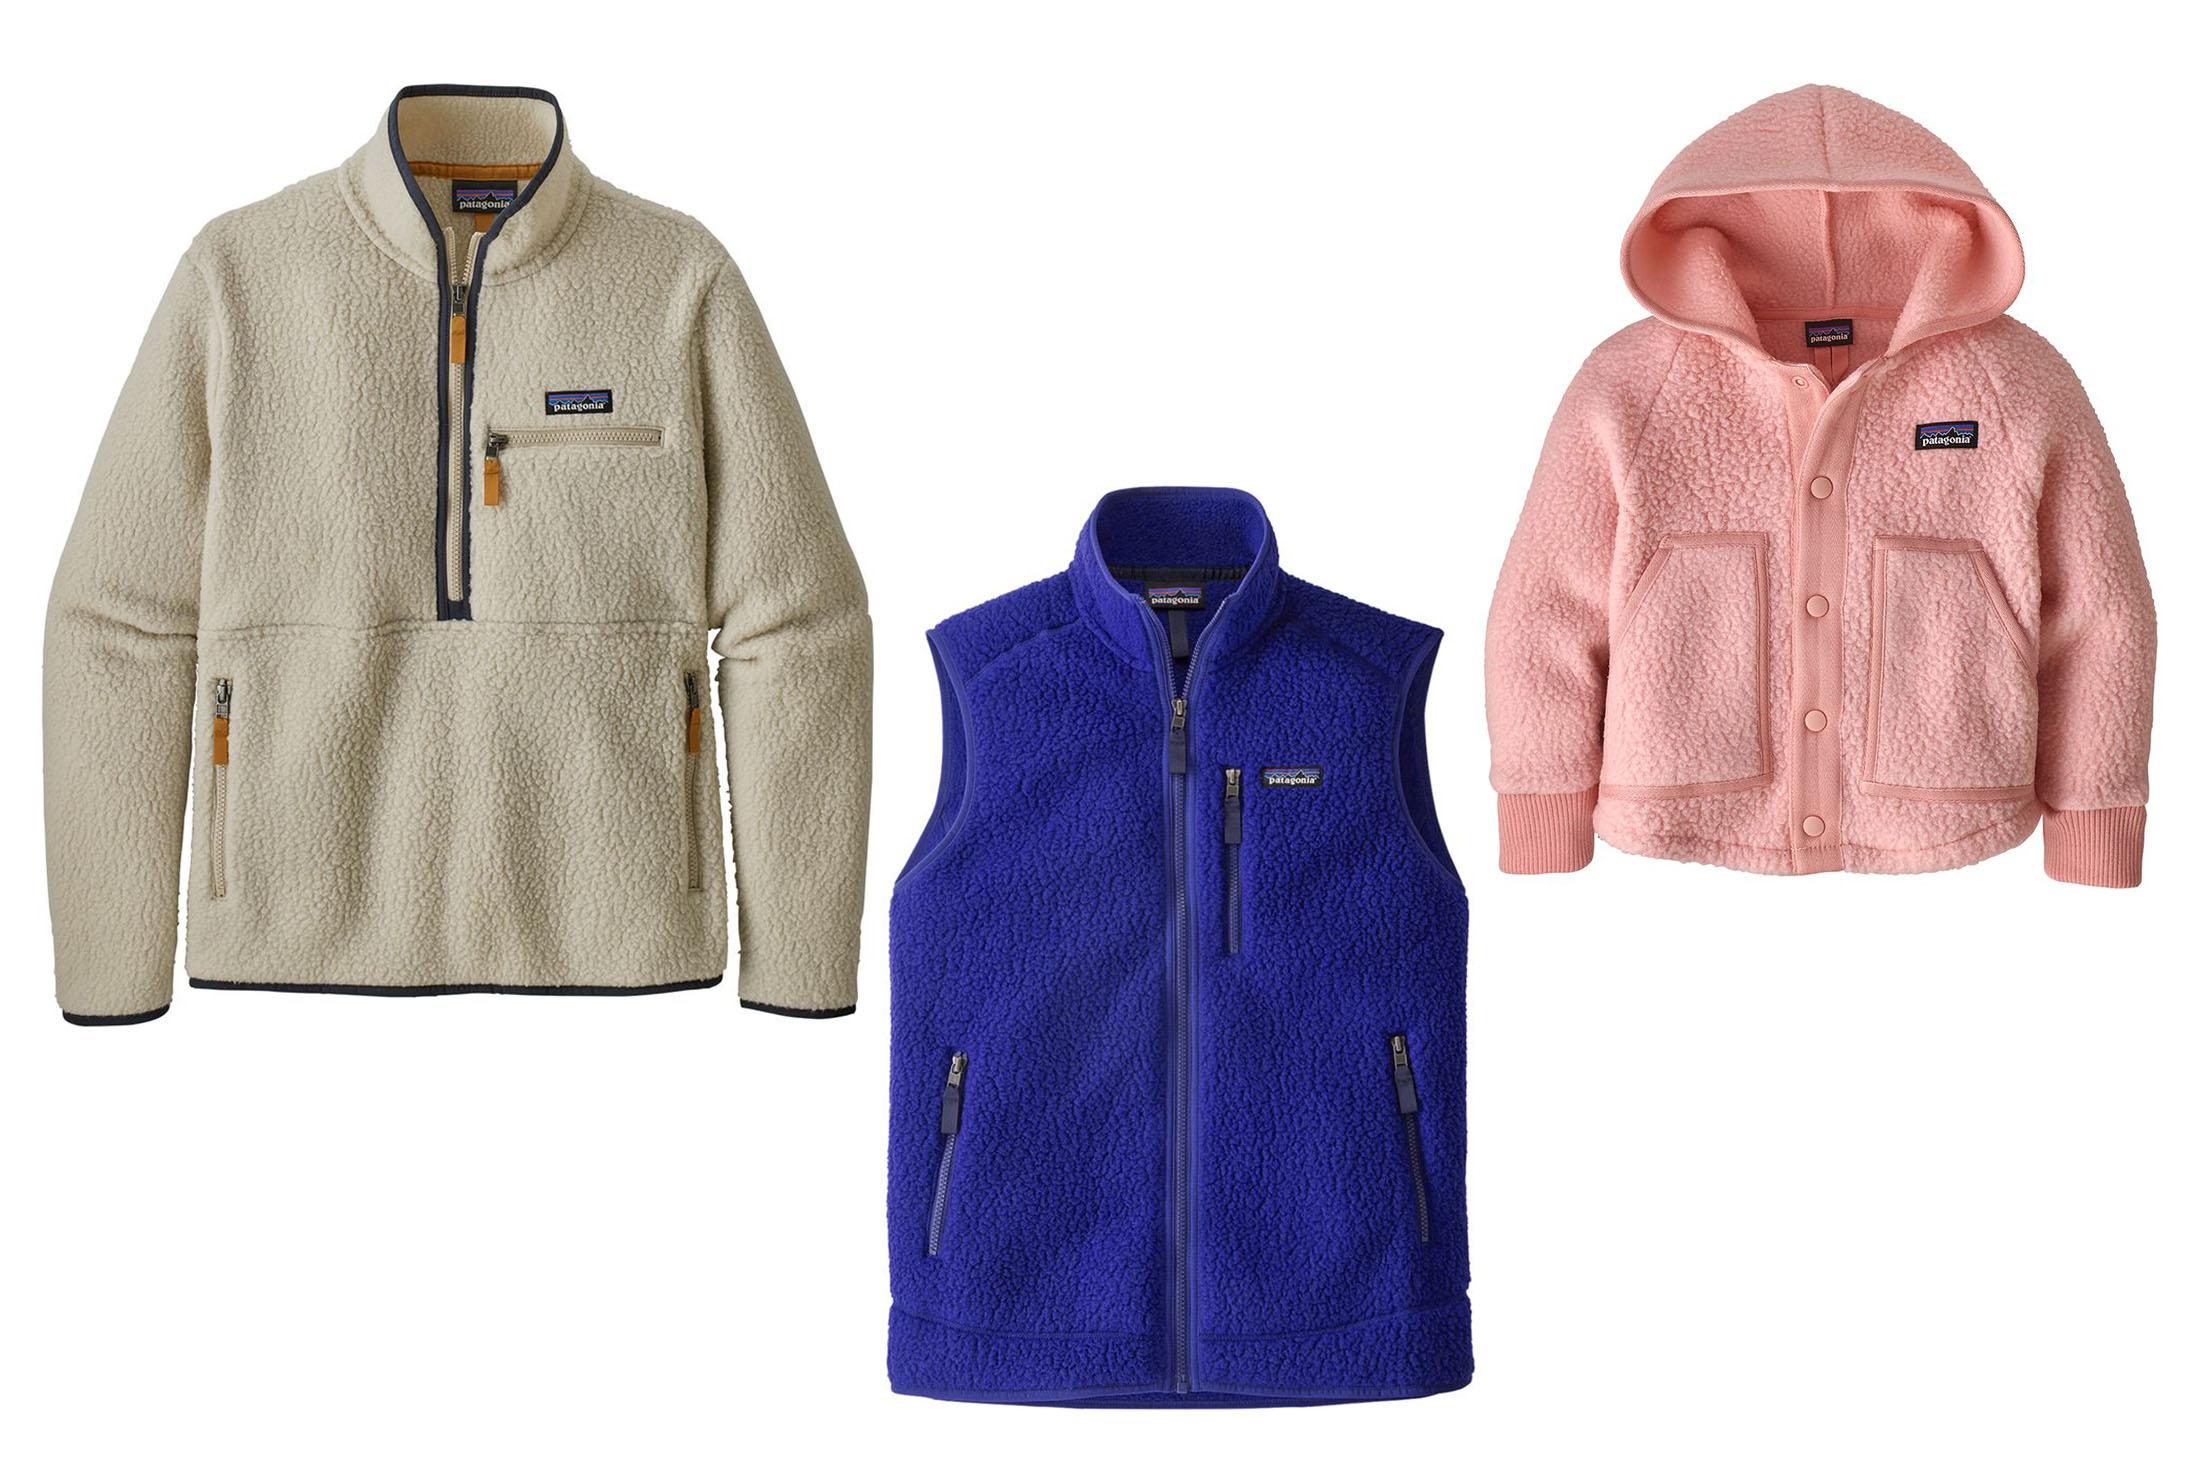 Assorted Patagonia Fleece Jackets